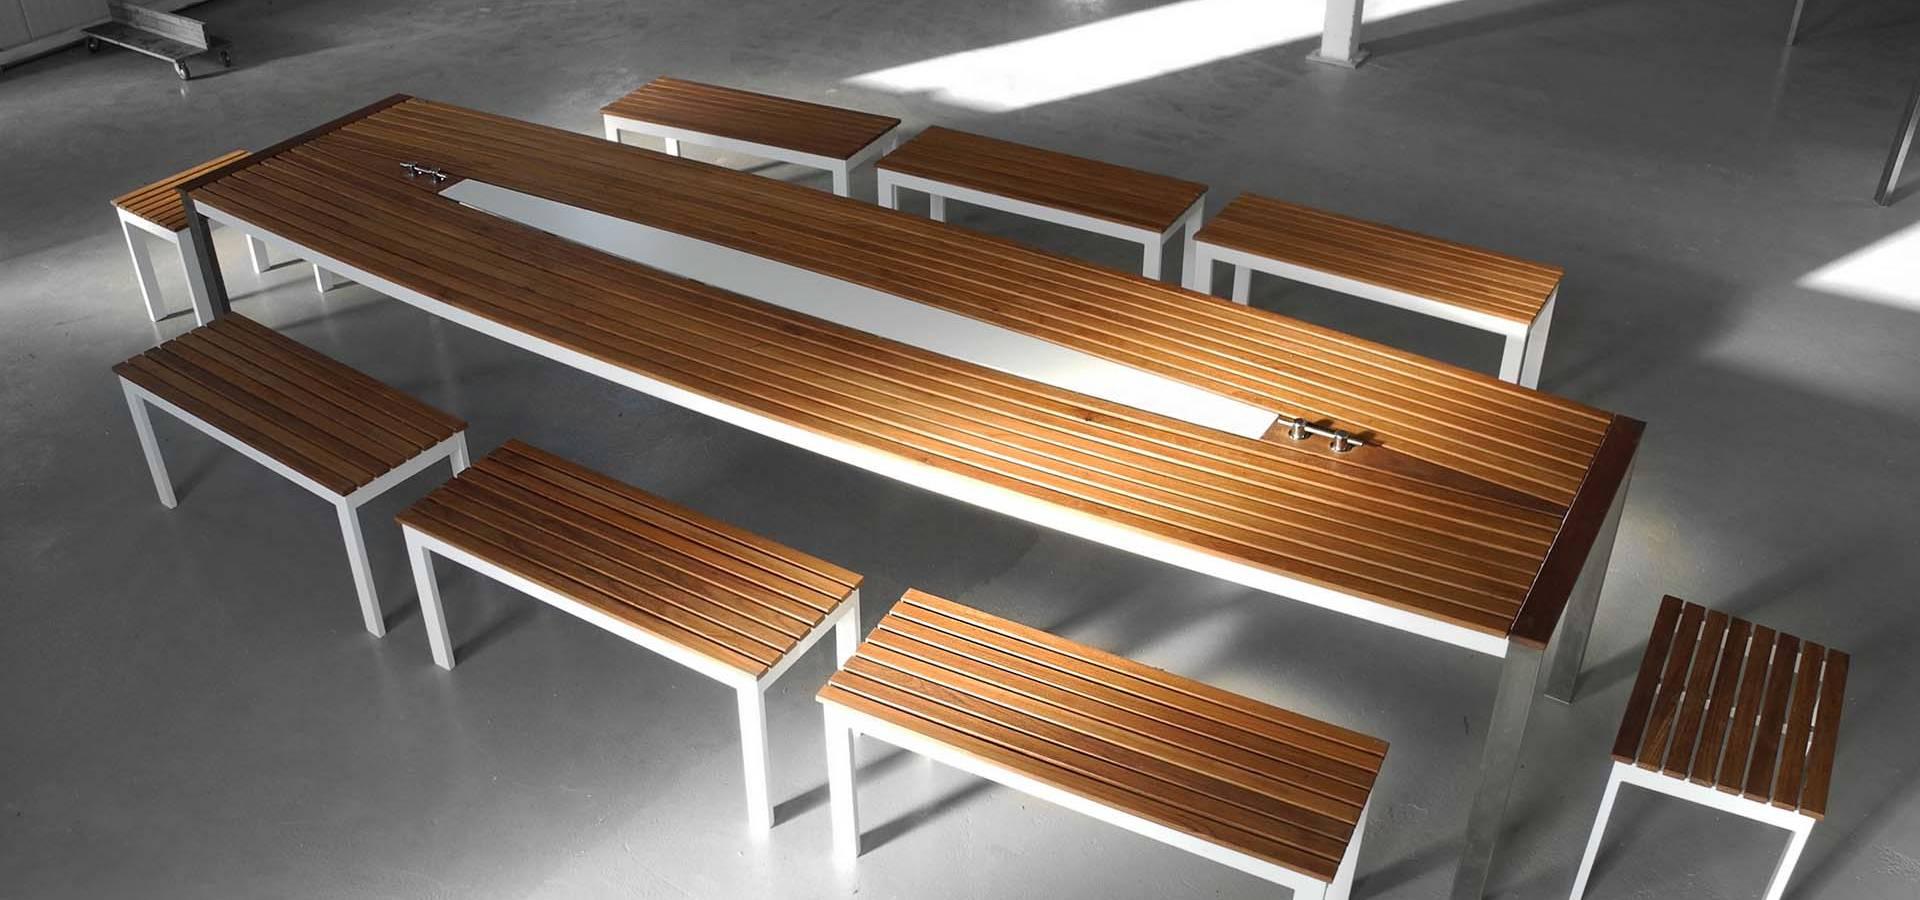 Design möbel stahl  Stahlzart® : Möbel & Accessoires in Großröhrsdorf   homify